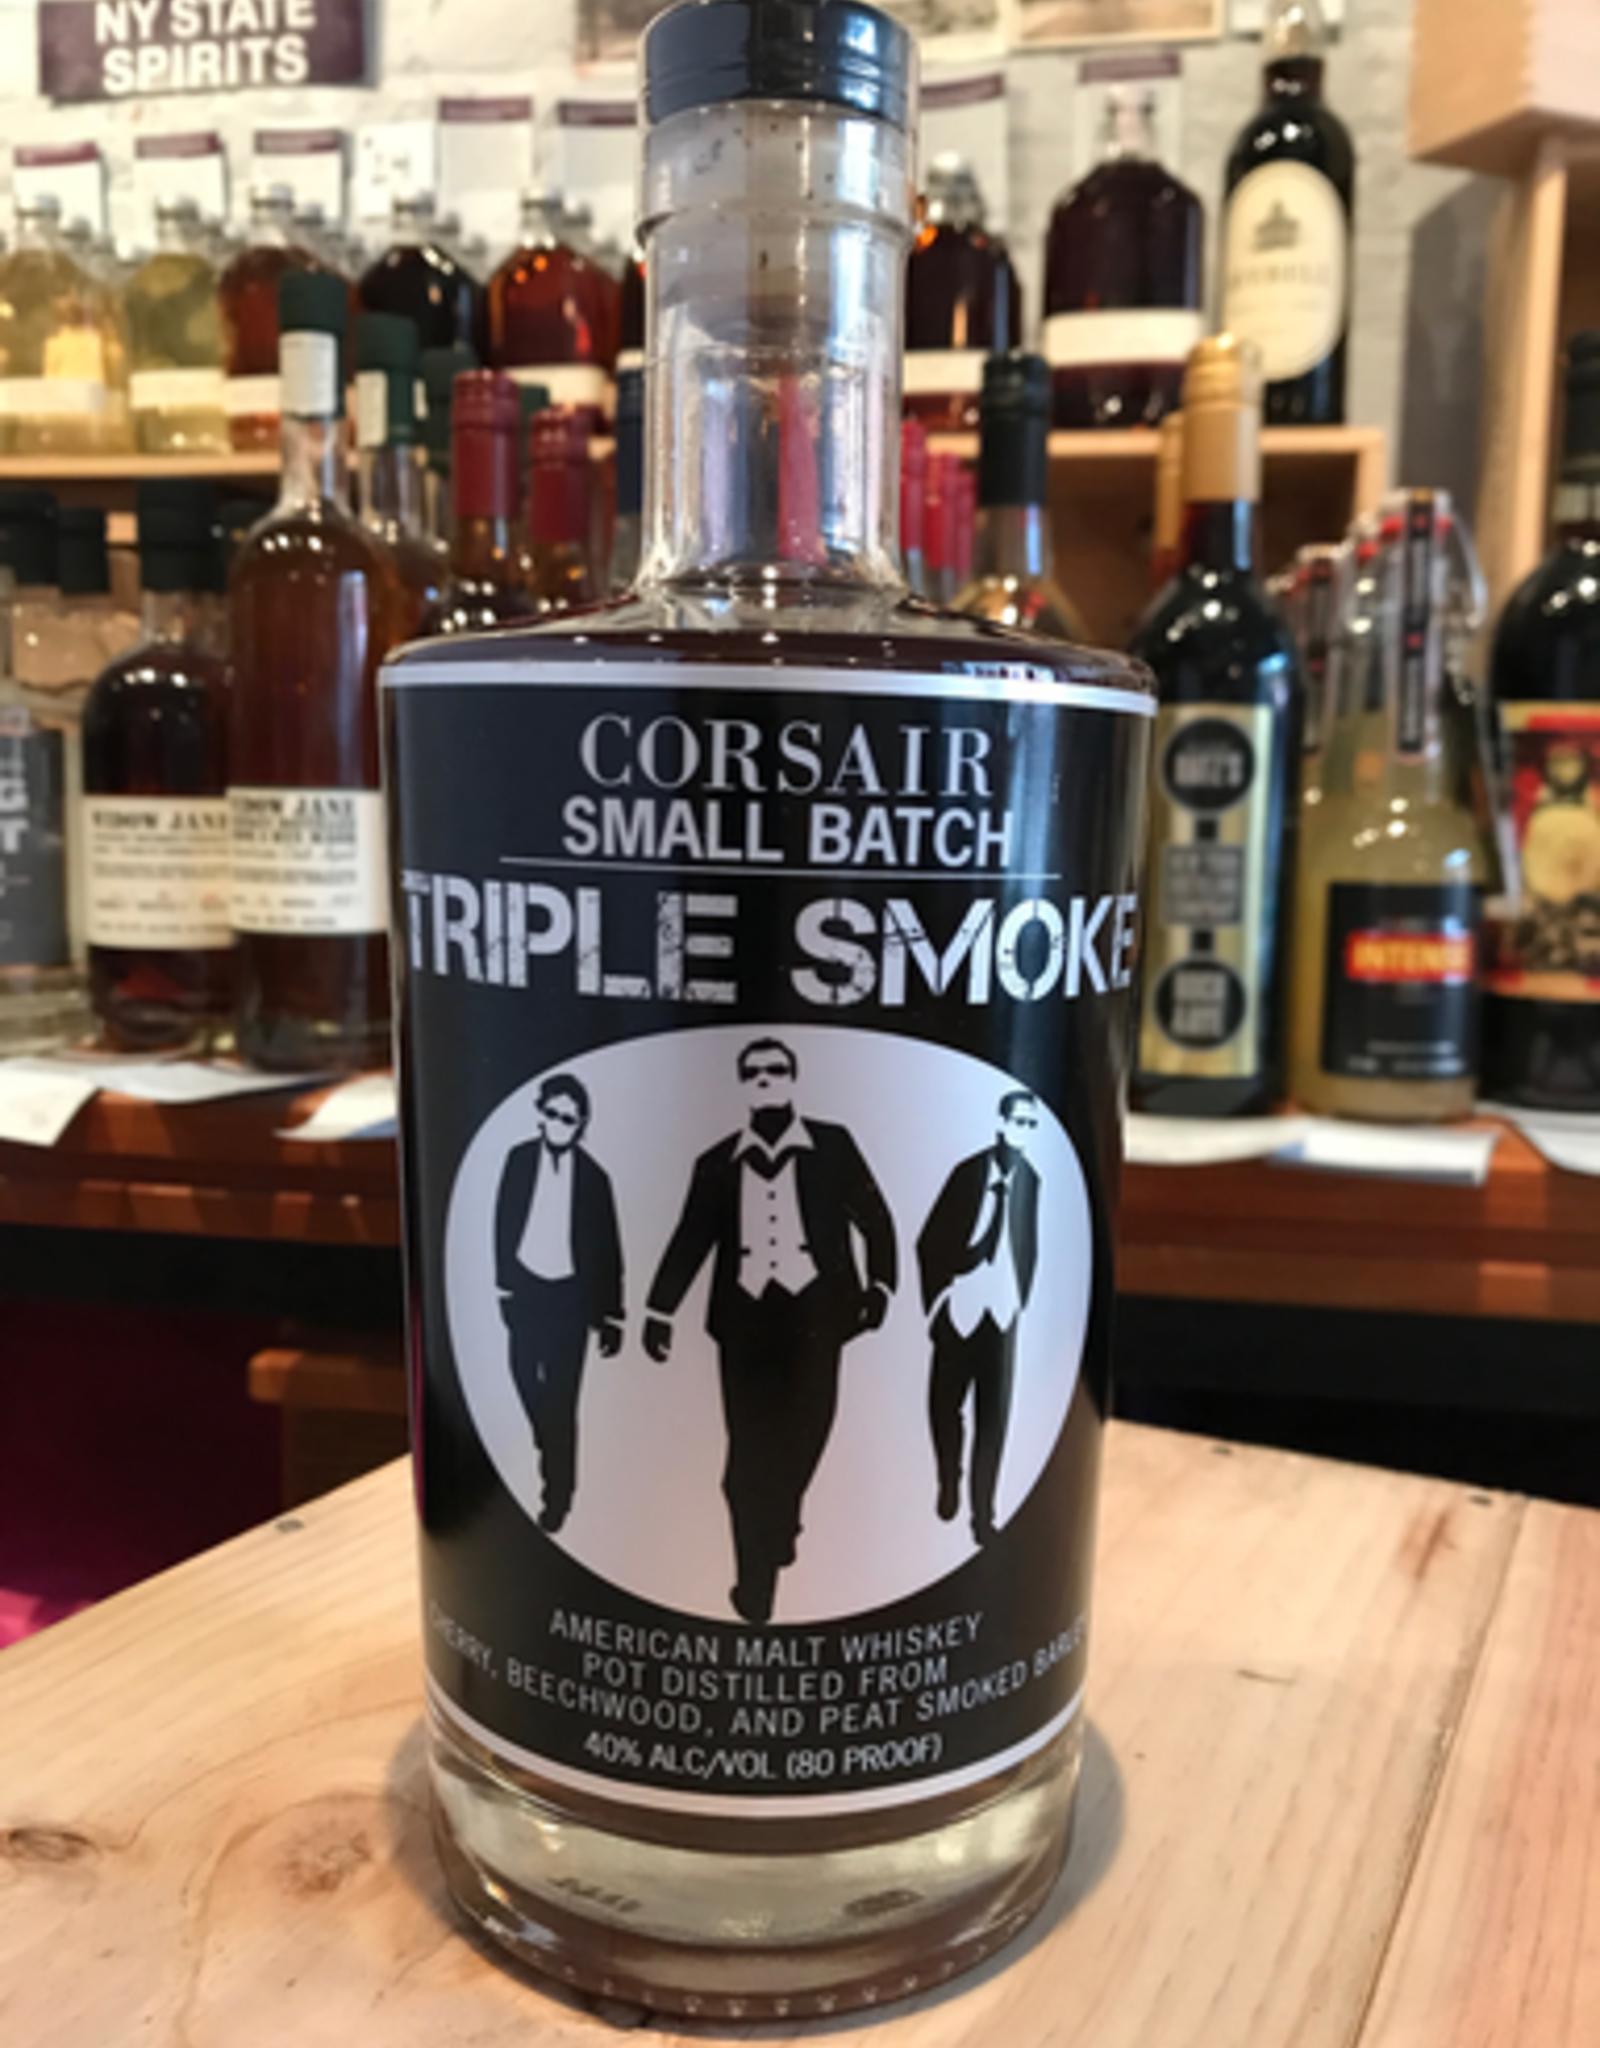 Corsair Small Batch Triple Smoke American Malt Whiskey - Nashville, Tennessee (750ml)